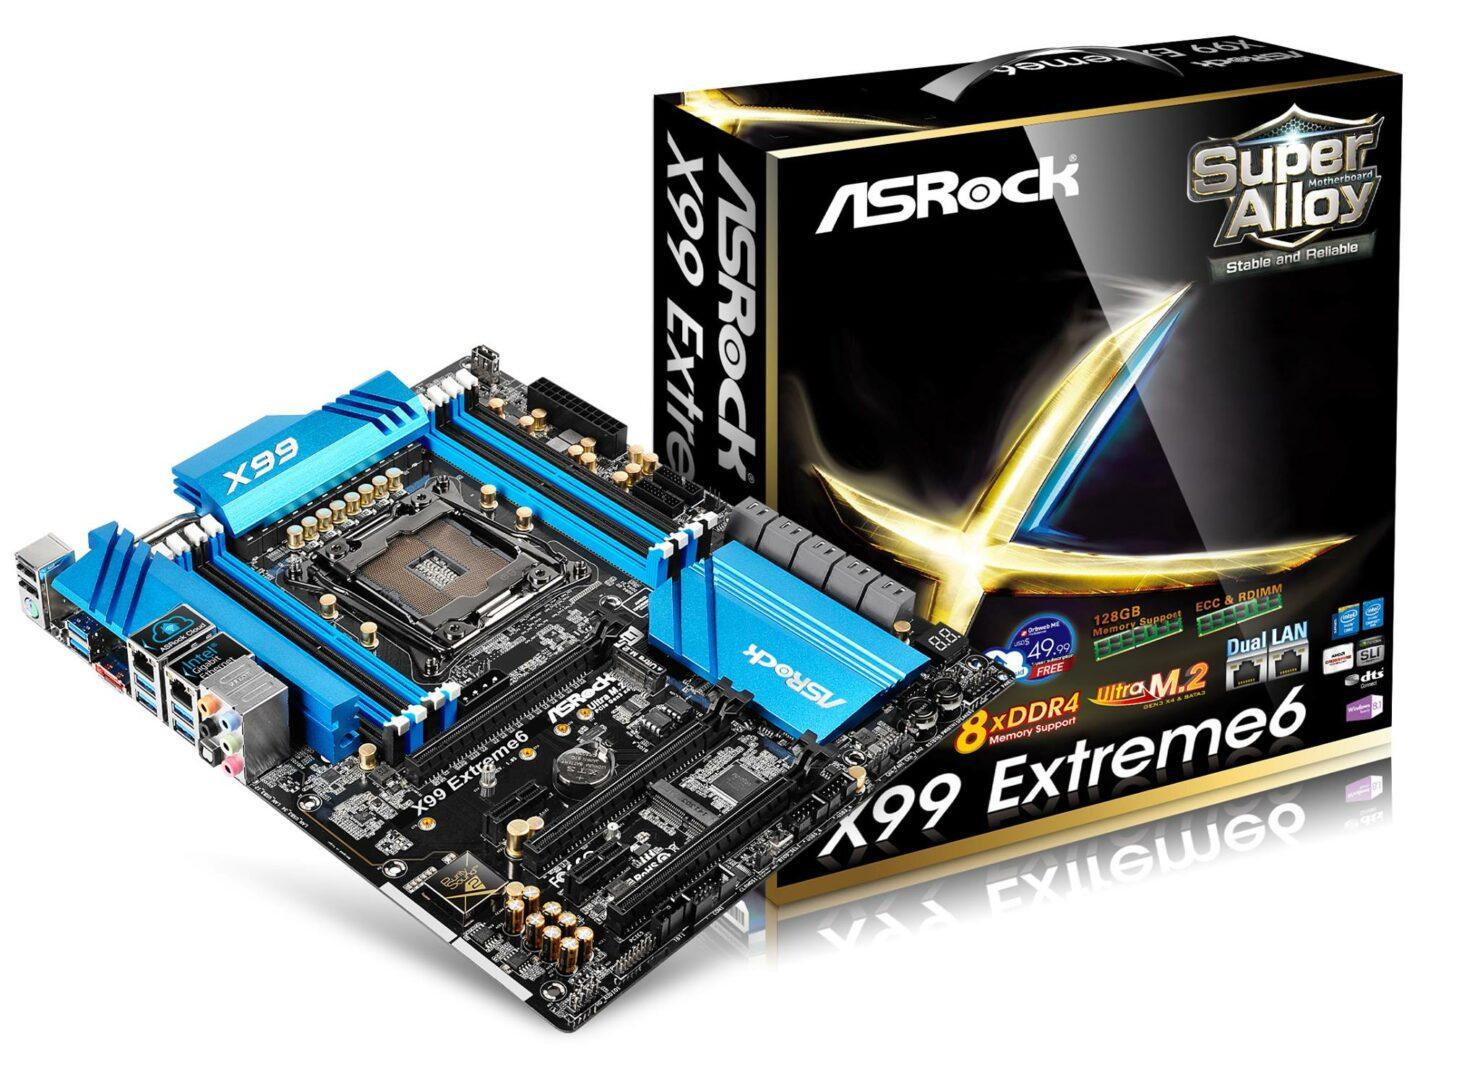 asrock-x99-extreme-6-box